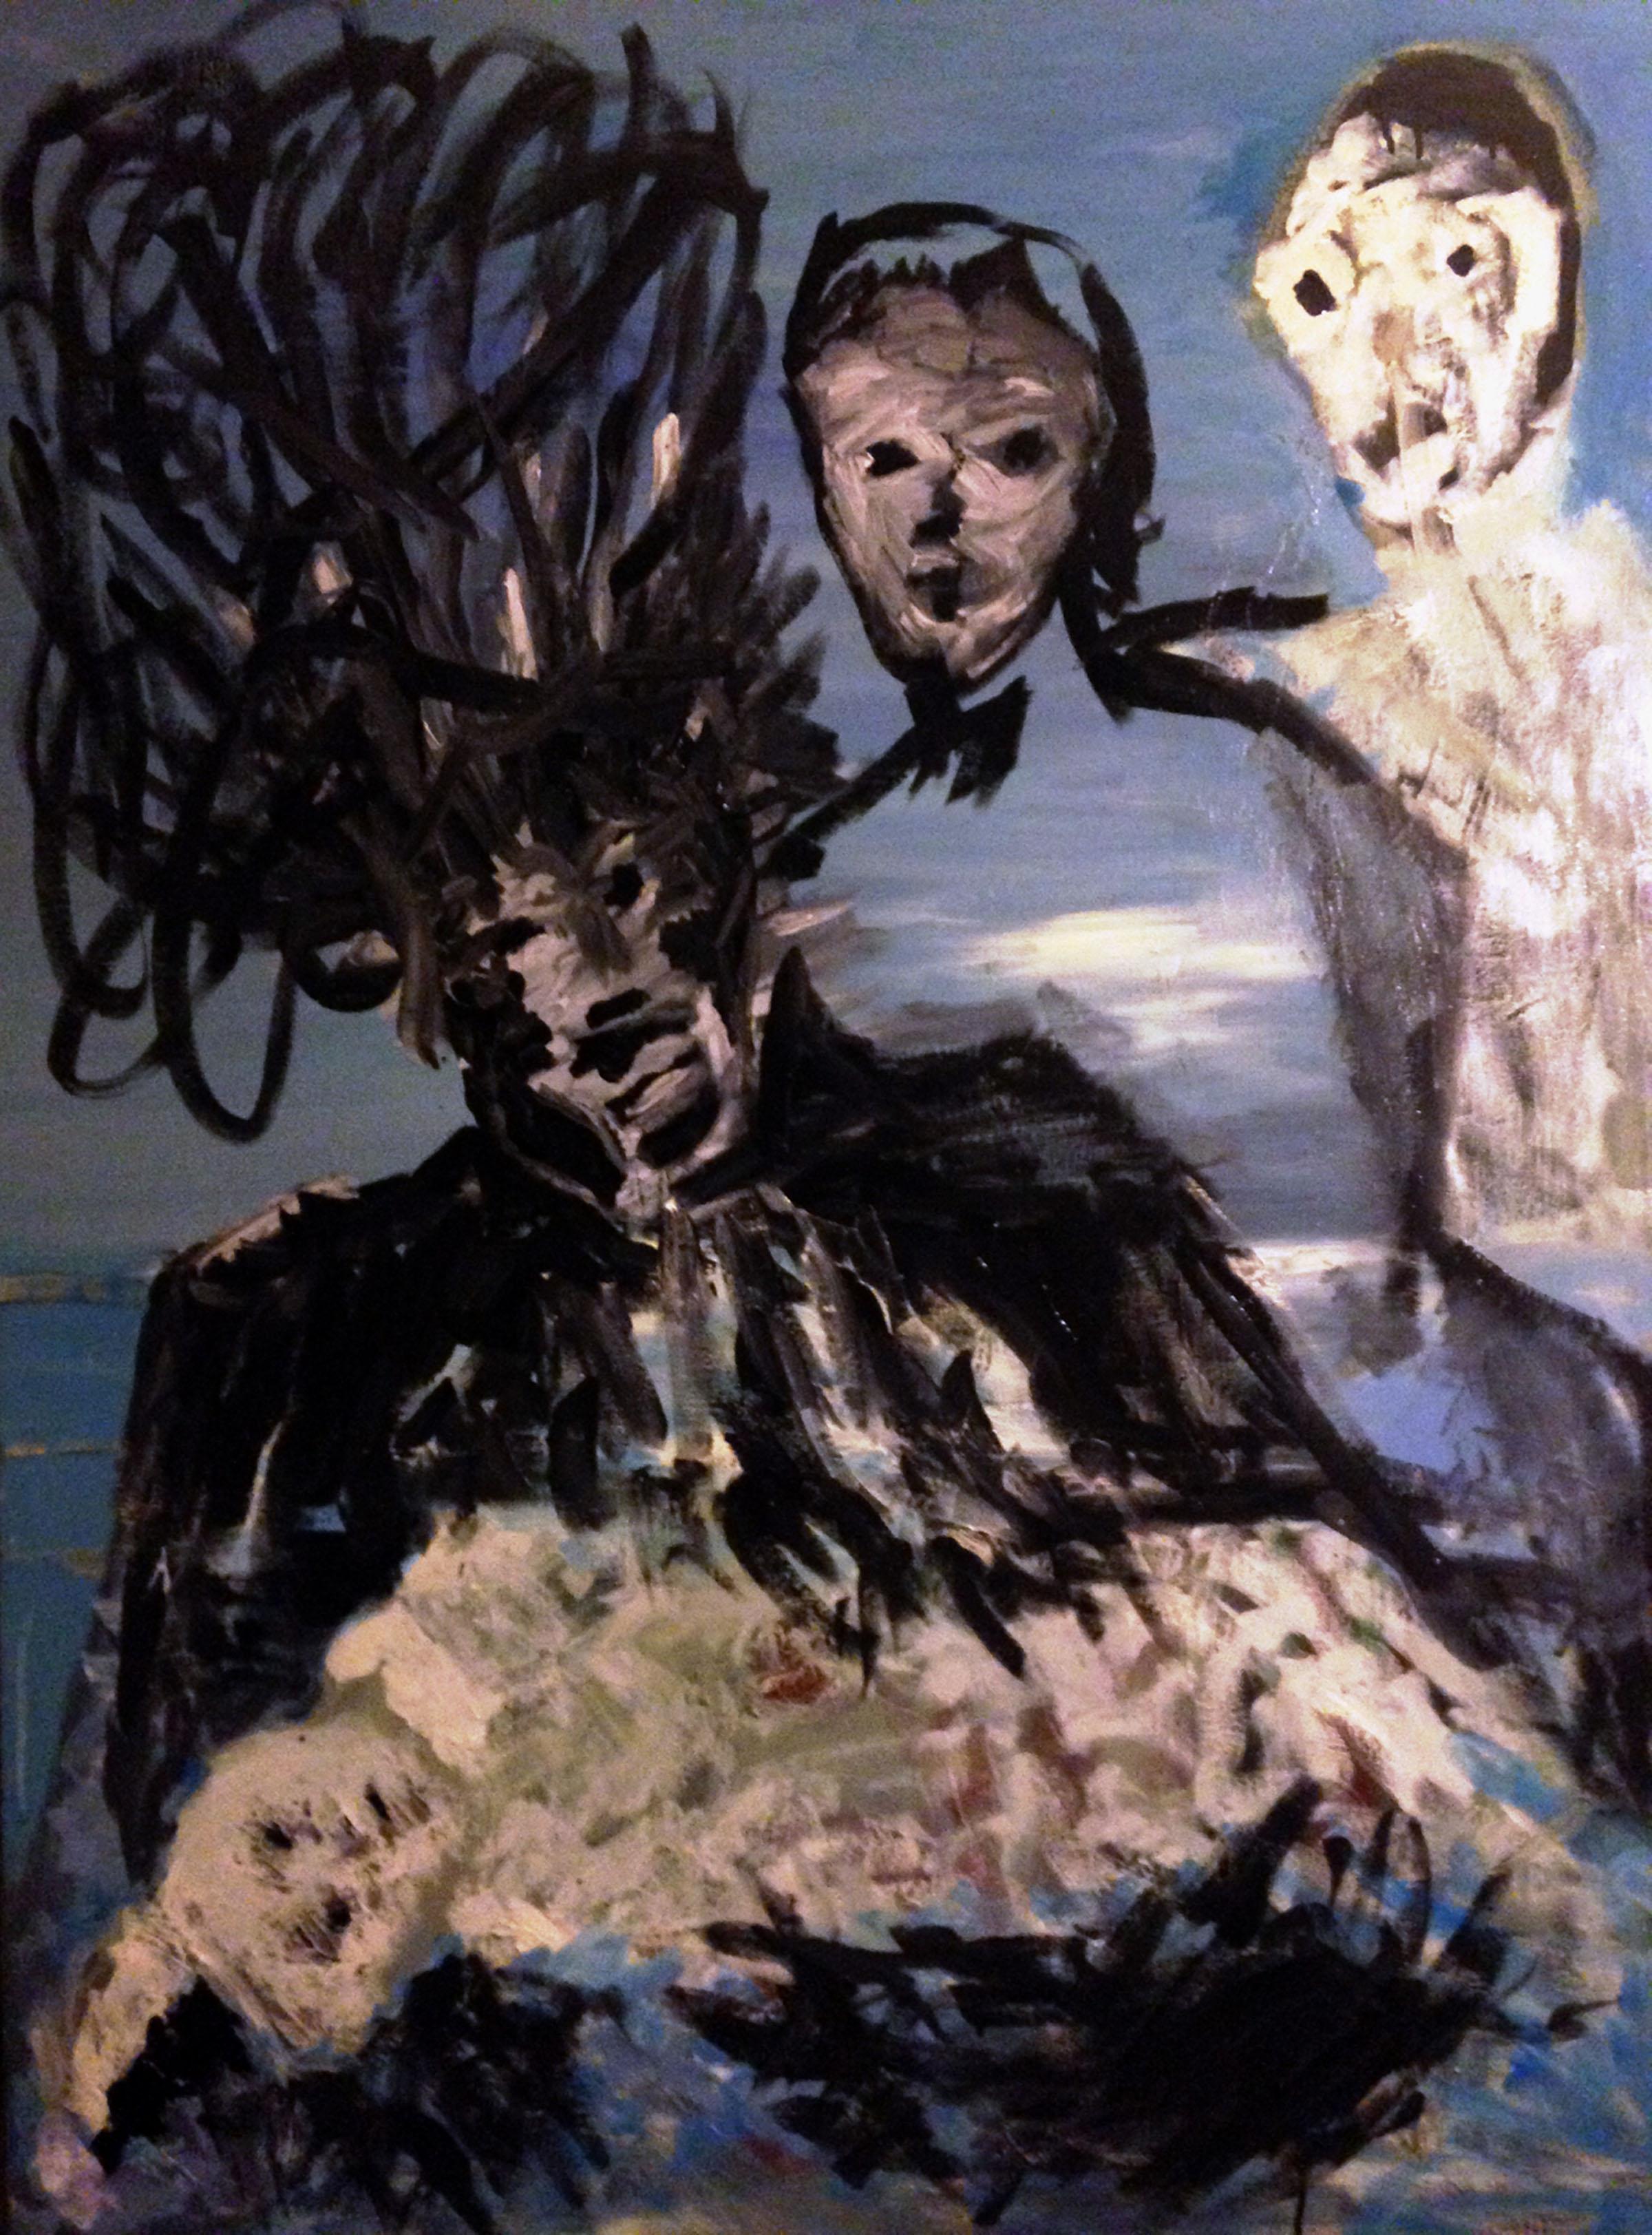 """The cradling of the clownchild,"" by Scott Trimble"